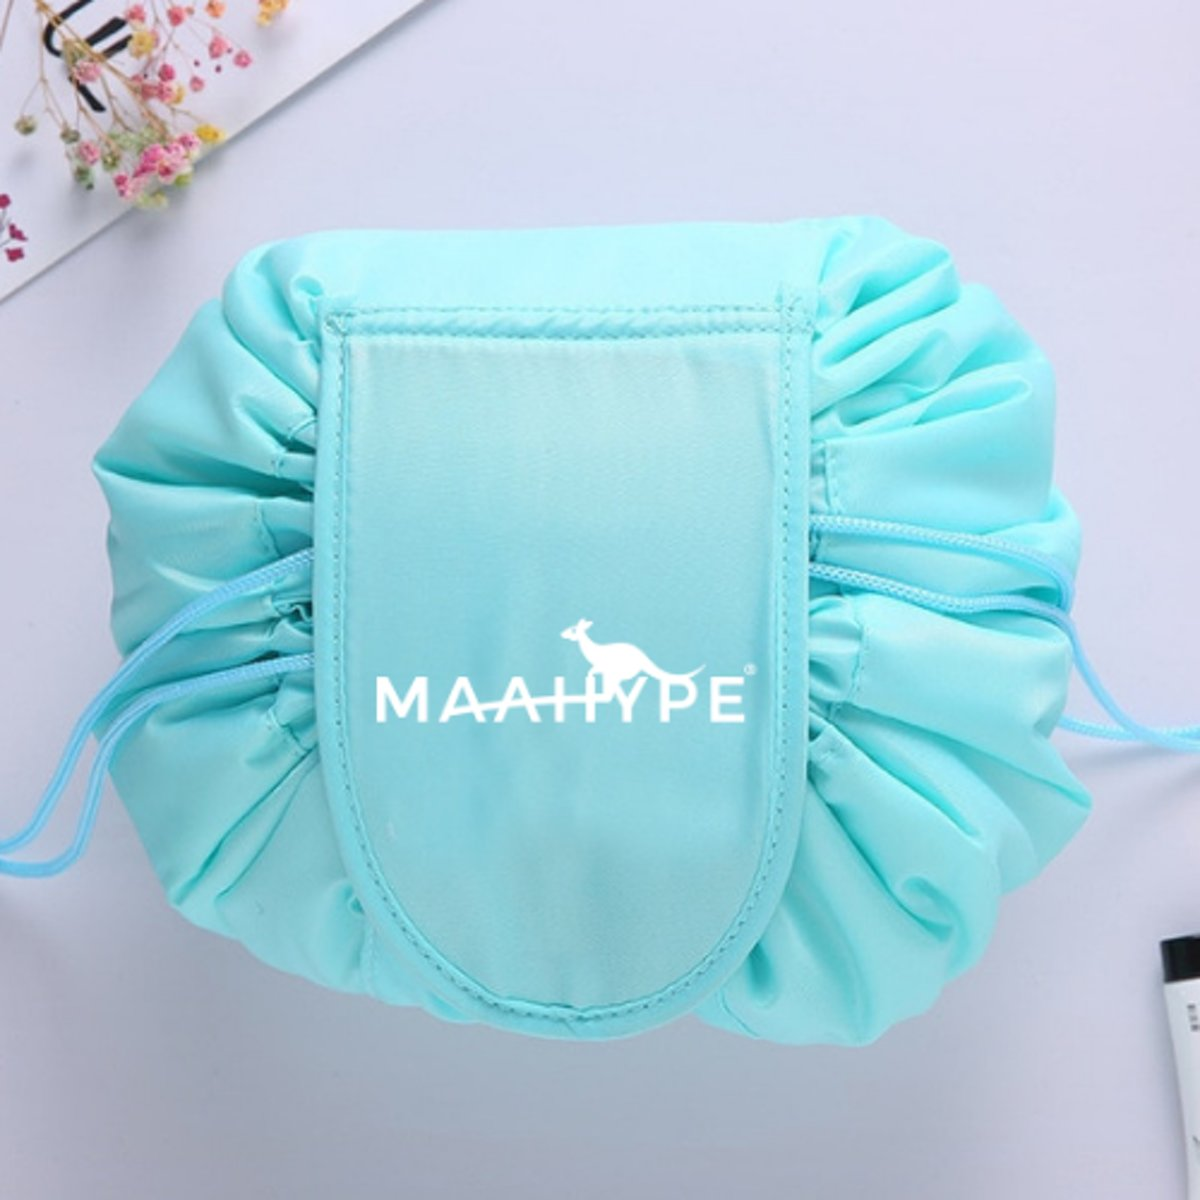 MaaHype Make-up organiser - Makeup opbergen - Accesoires organiser - Opbergsysteem - Reis toilettas - lichtblauw kopen